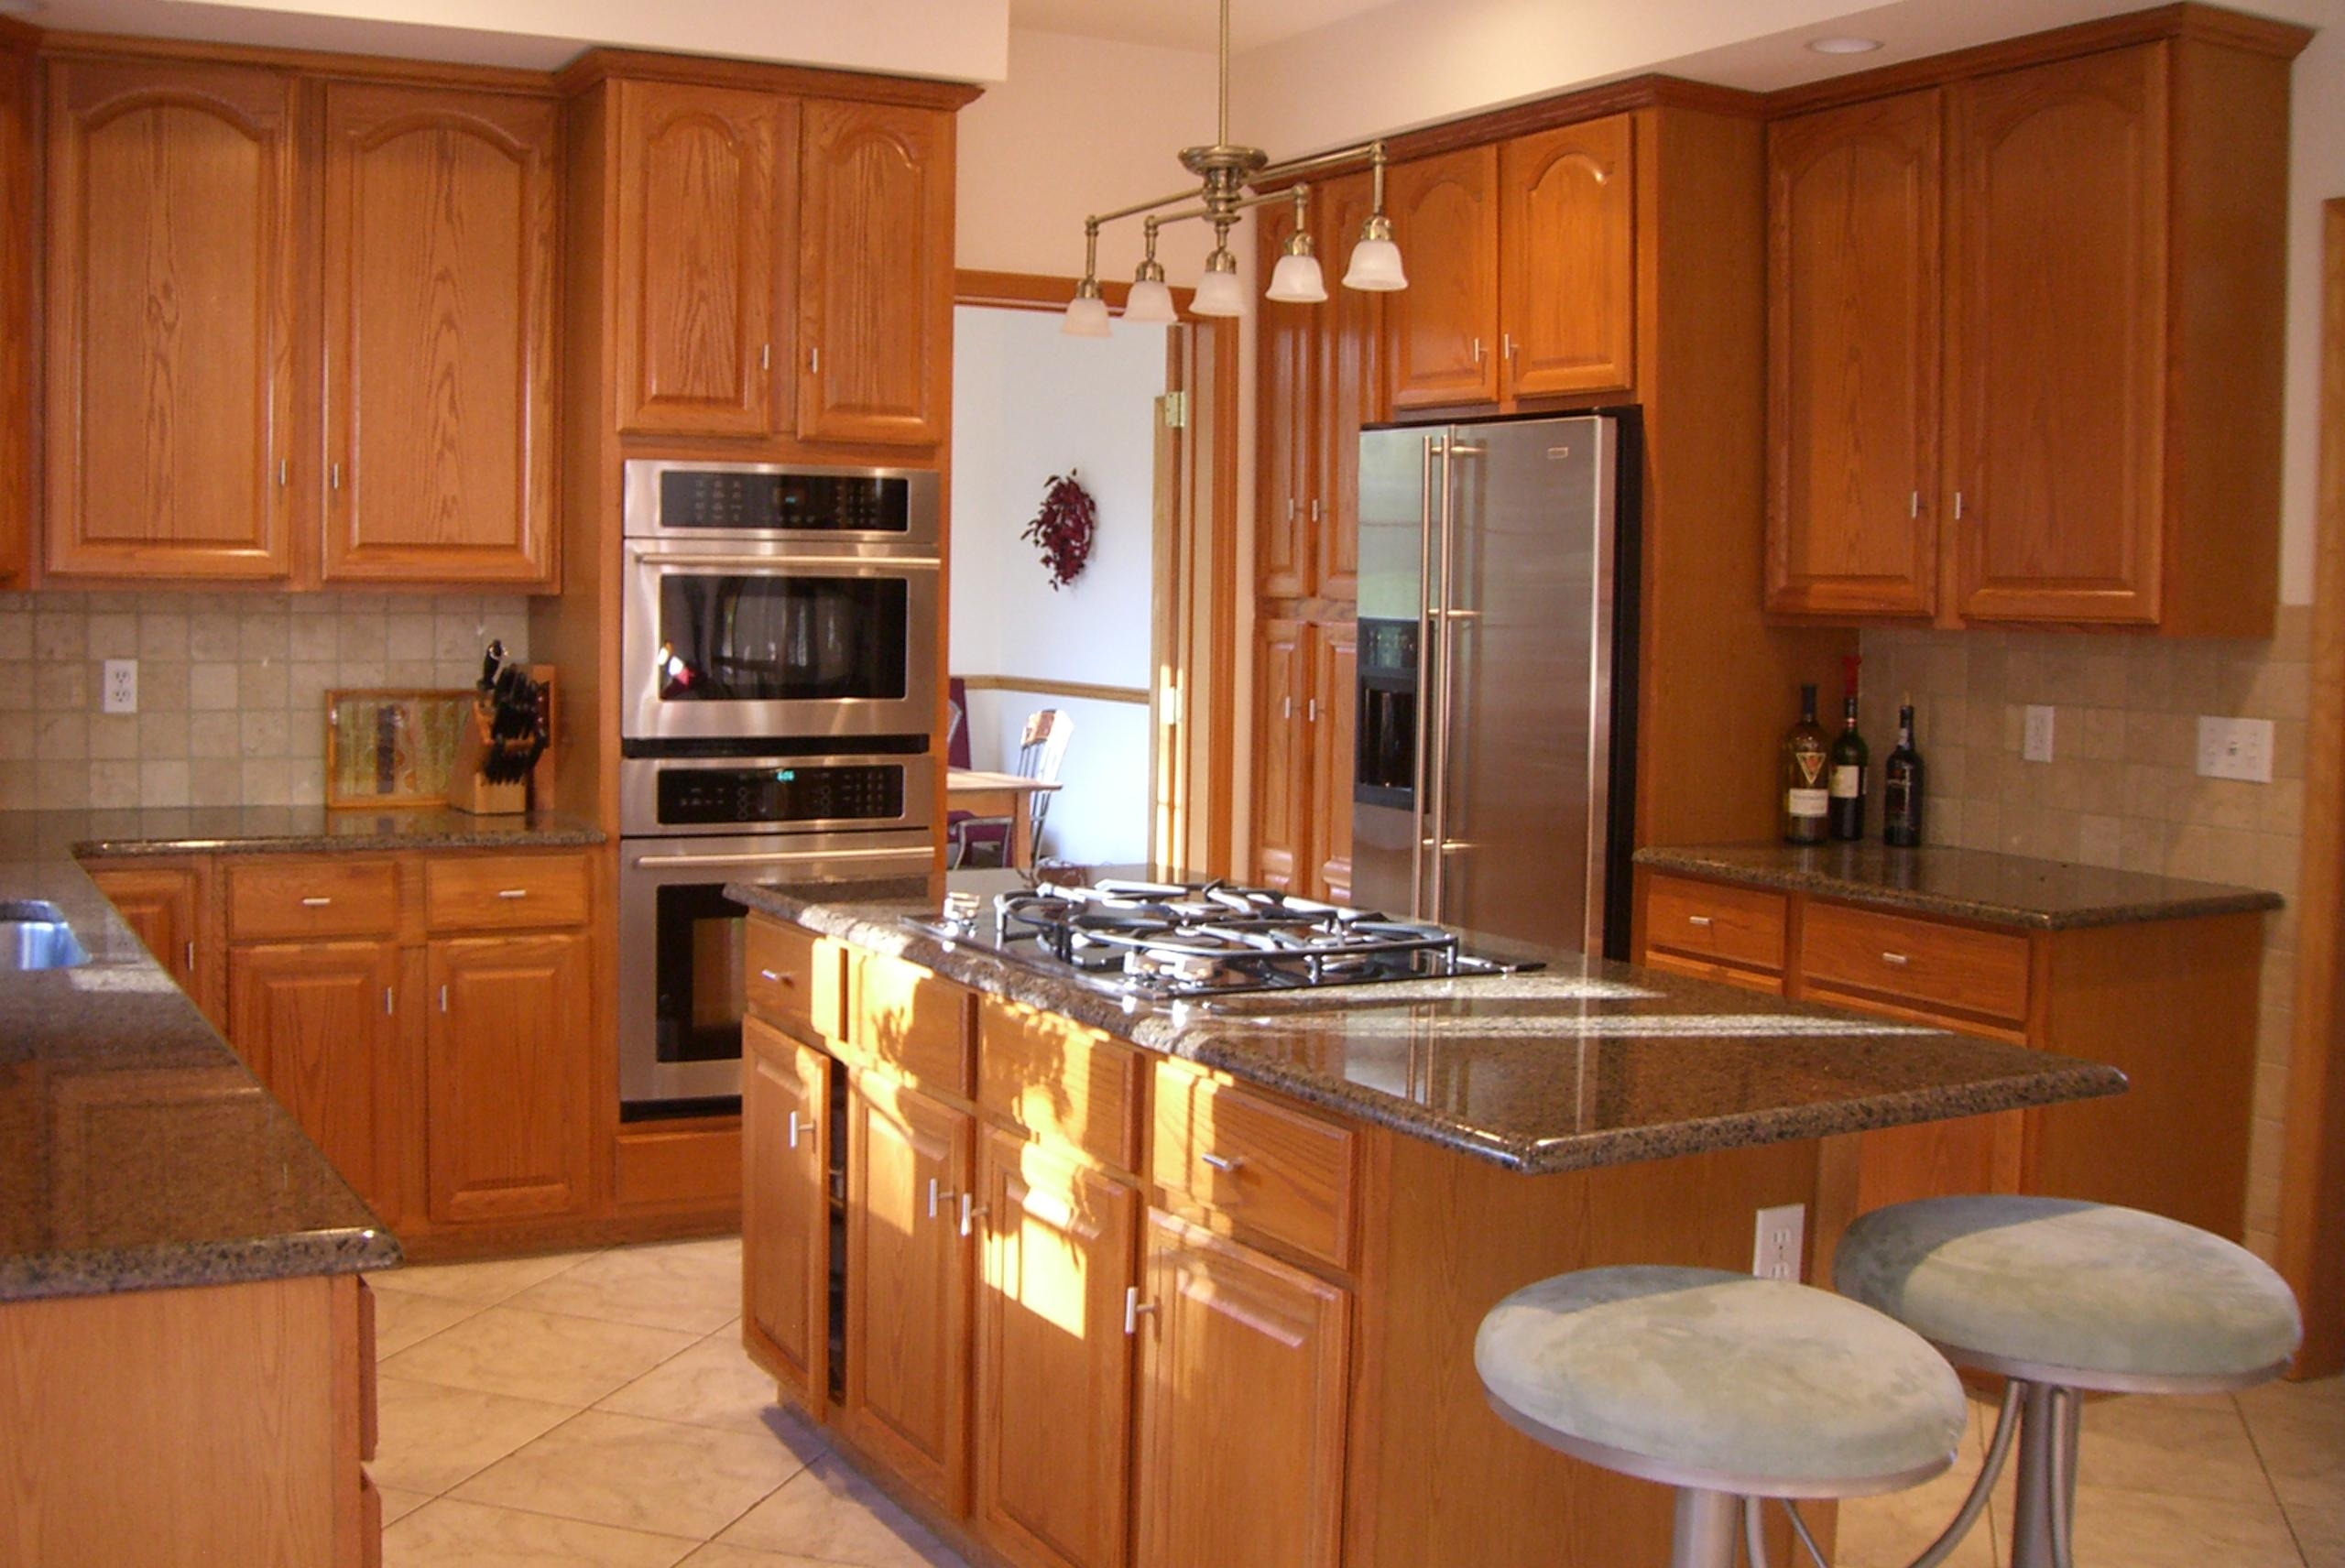 small kitchen layouts ideas photo - 2